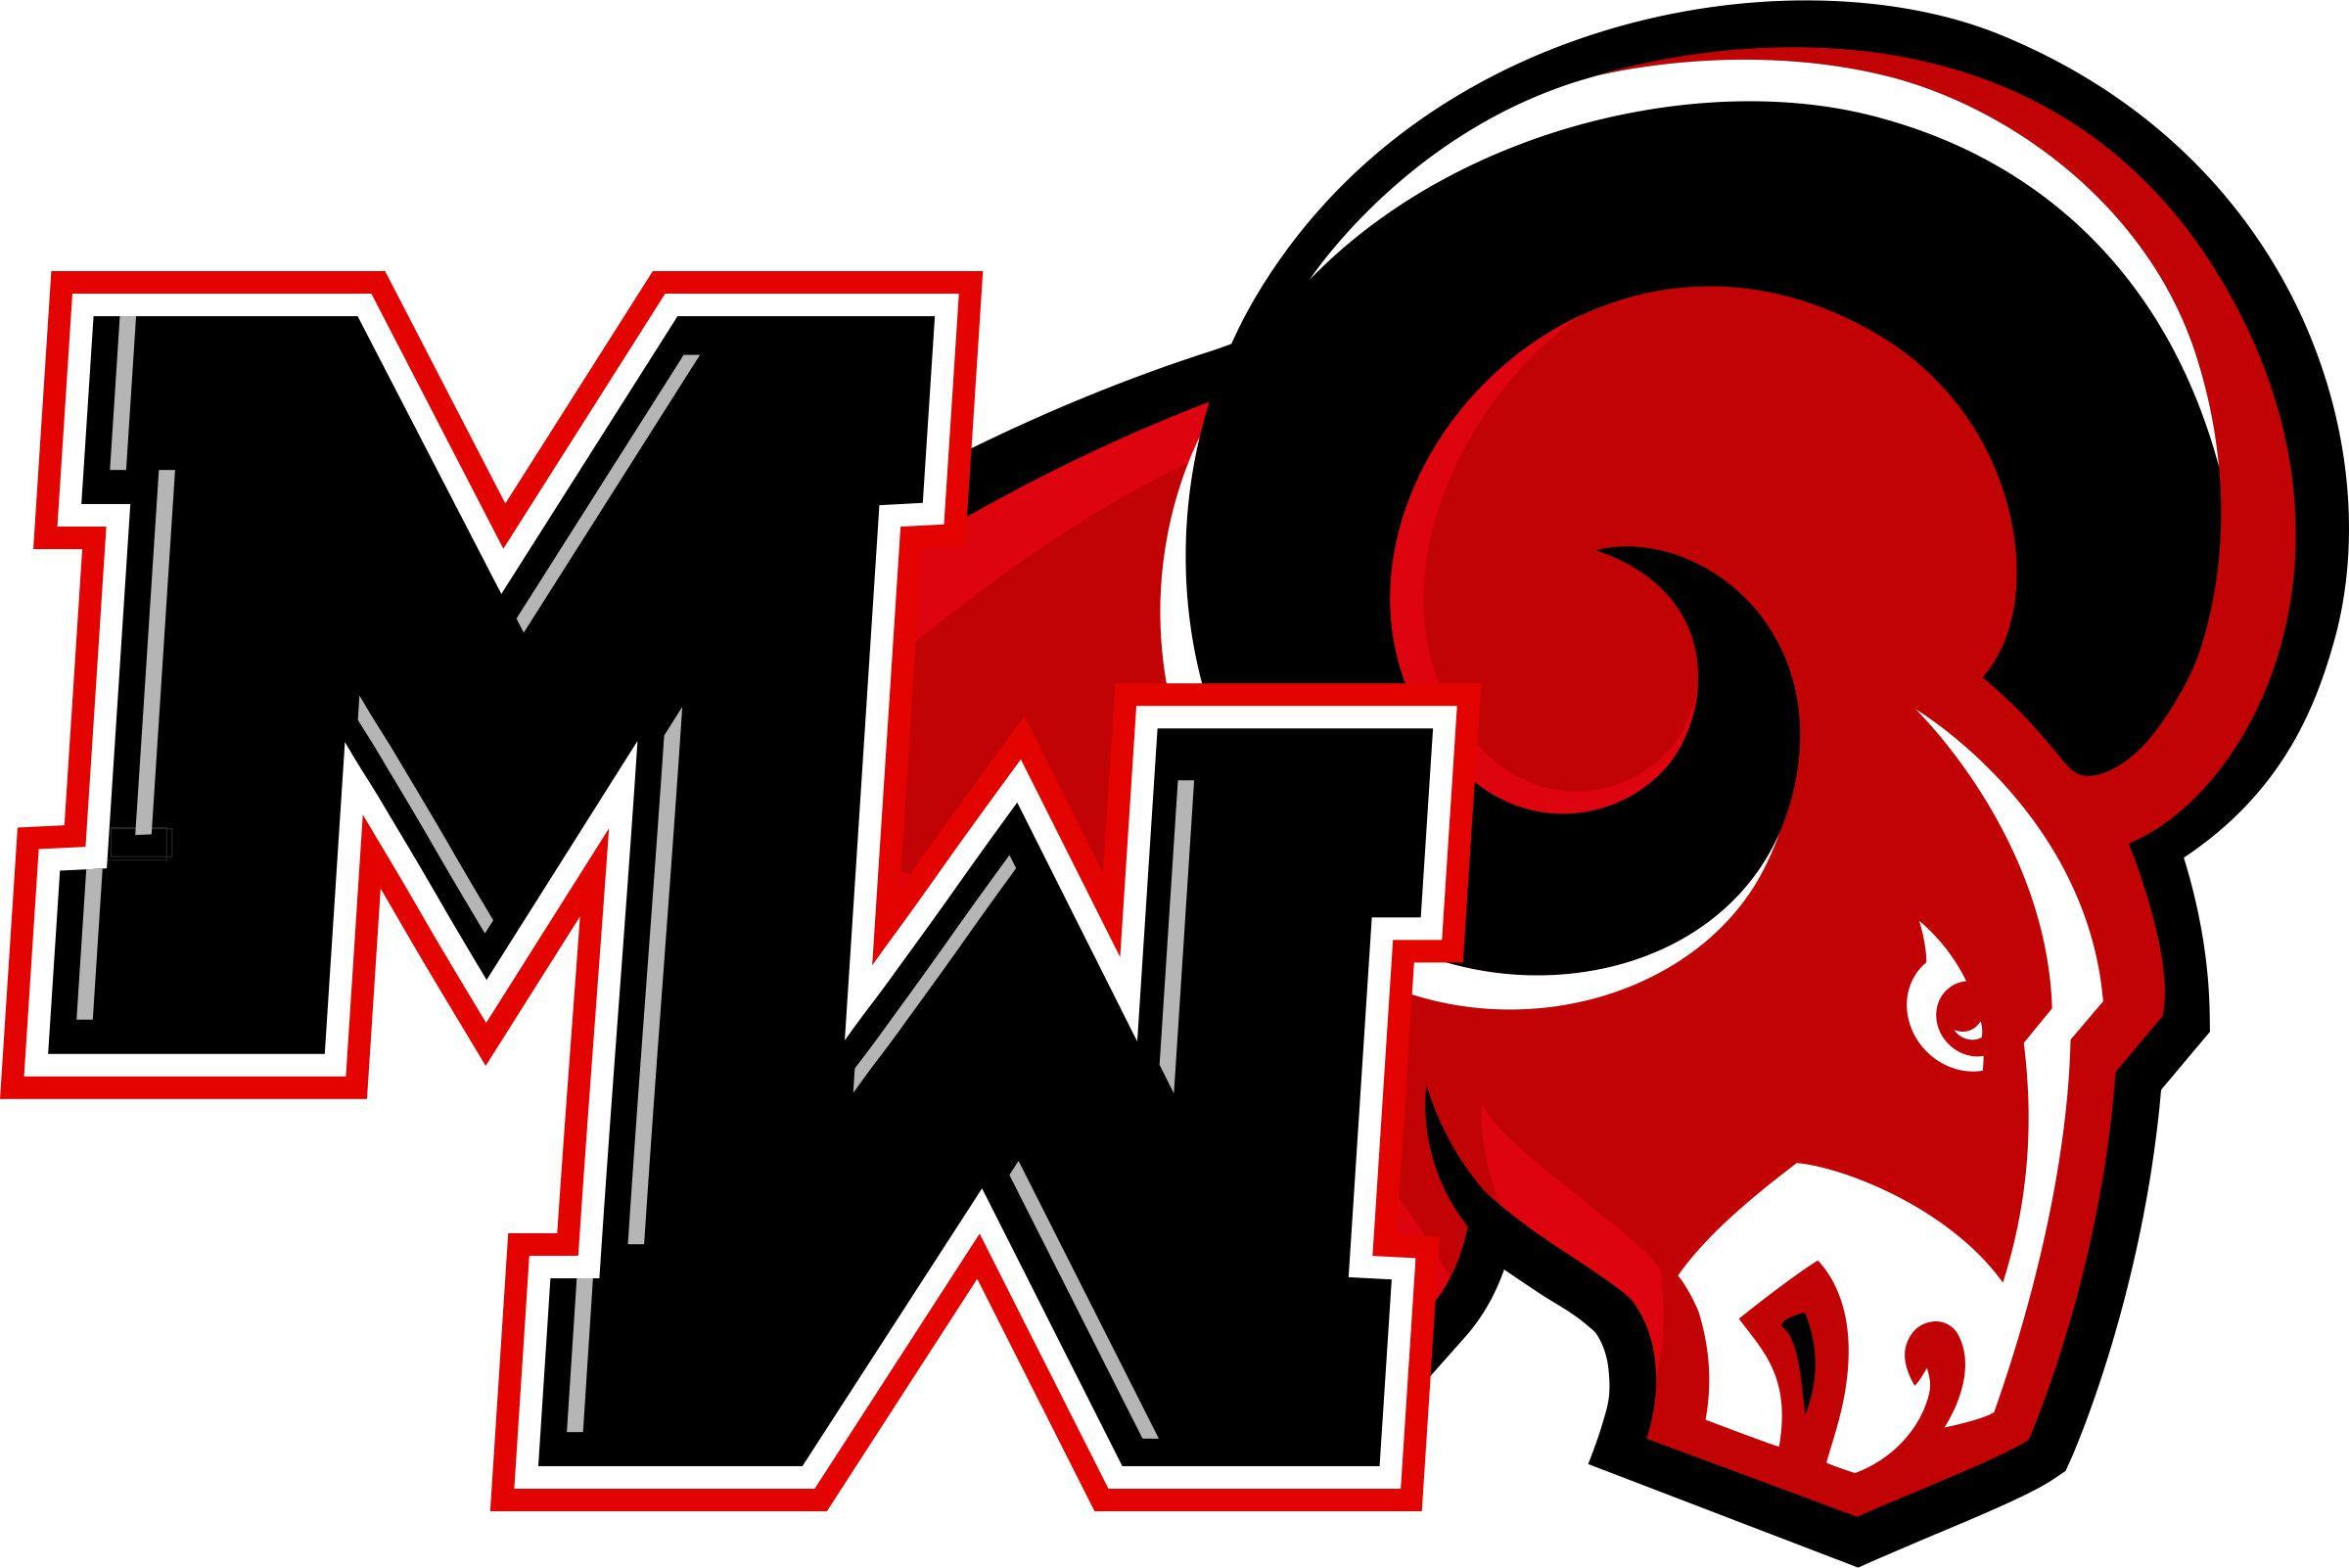 logo downloads mwisd logos mineral wells independent school district